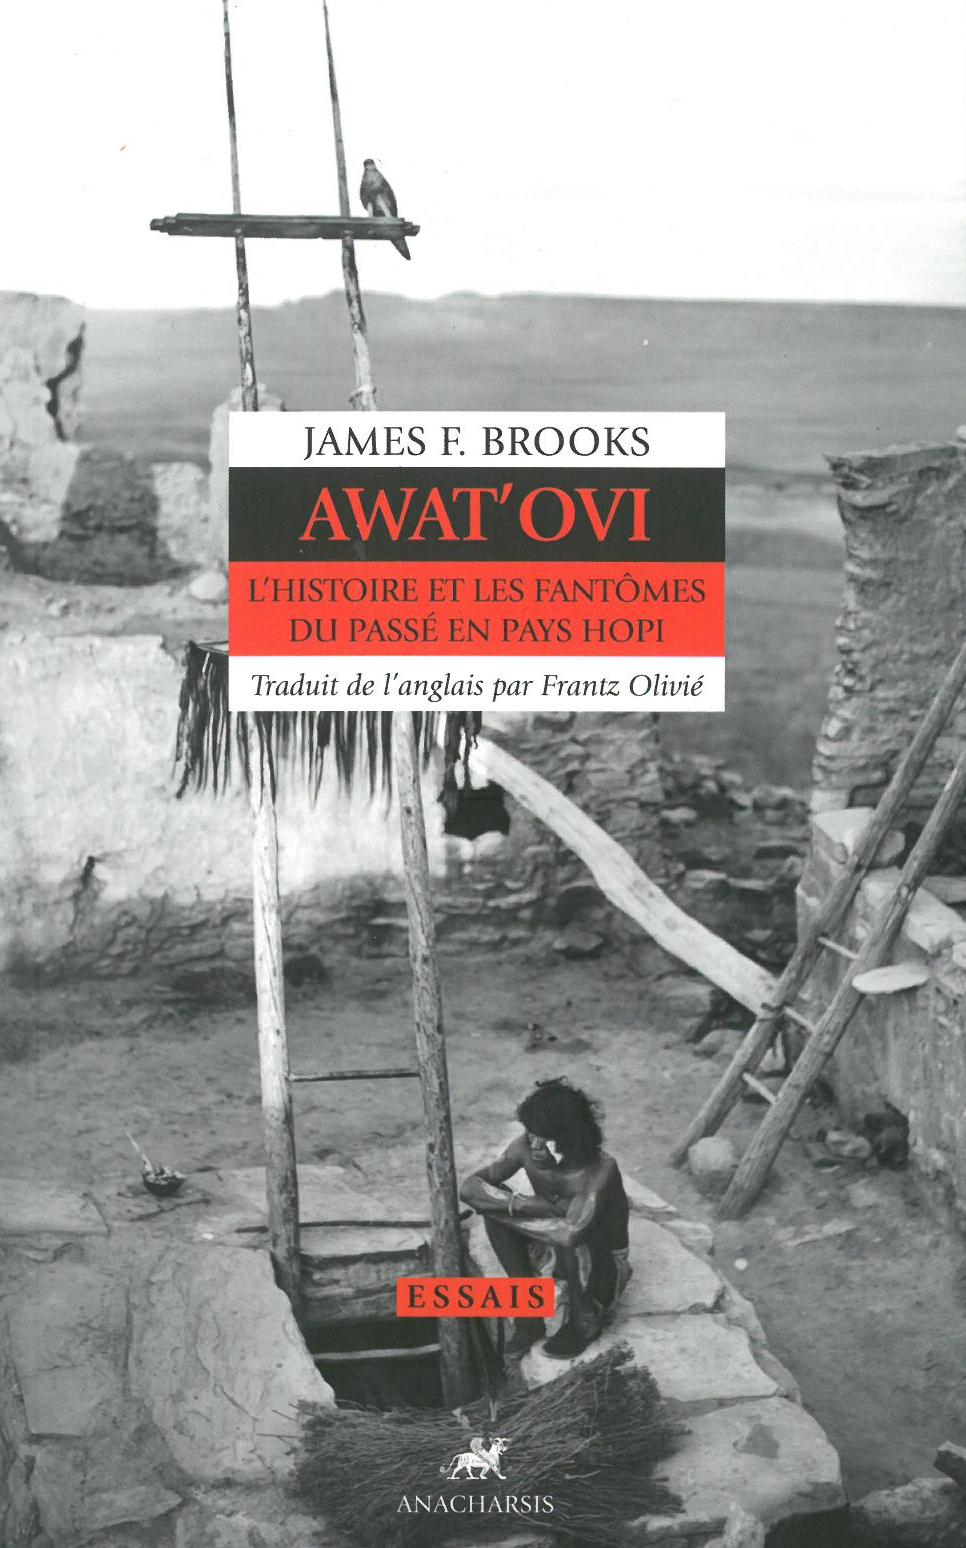 AWAT'OVI